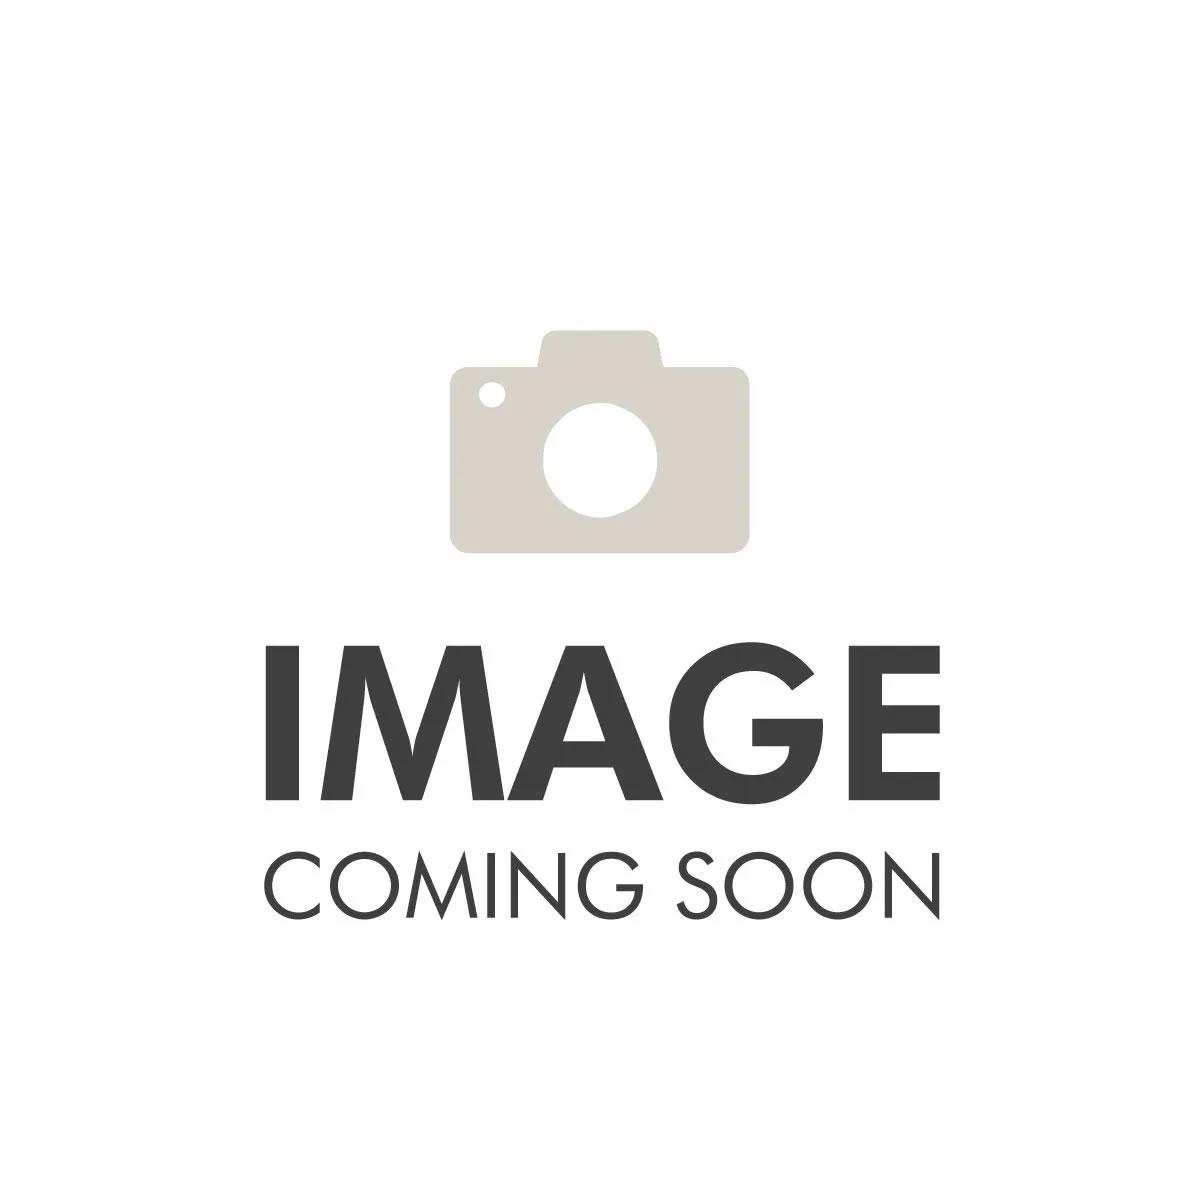 Fabric Rear Seat Covers, Gray; 80-95 Jeep CJ/Wrangler YJ